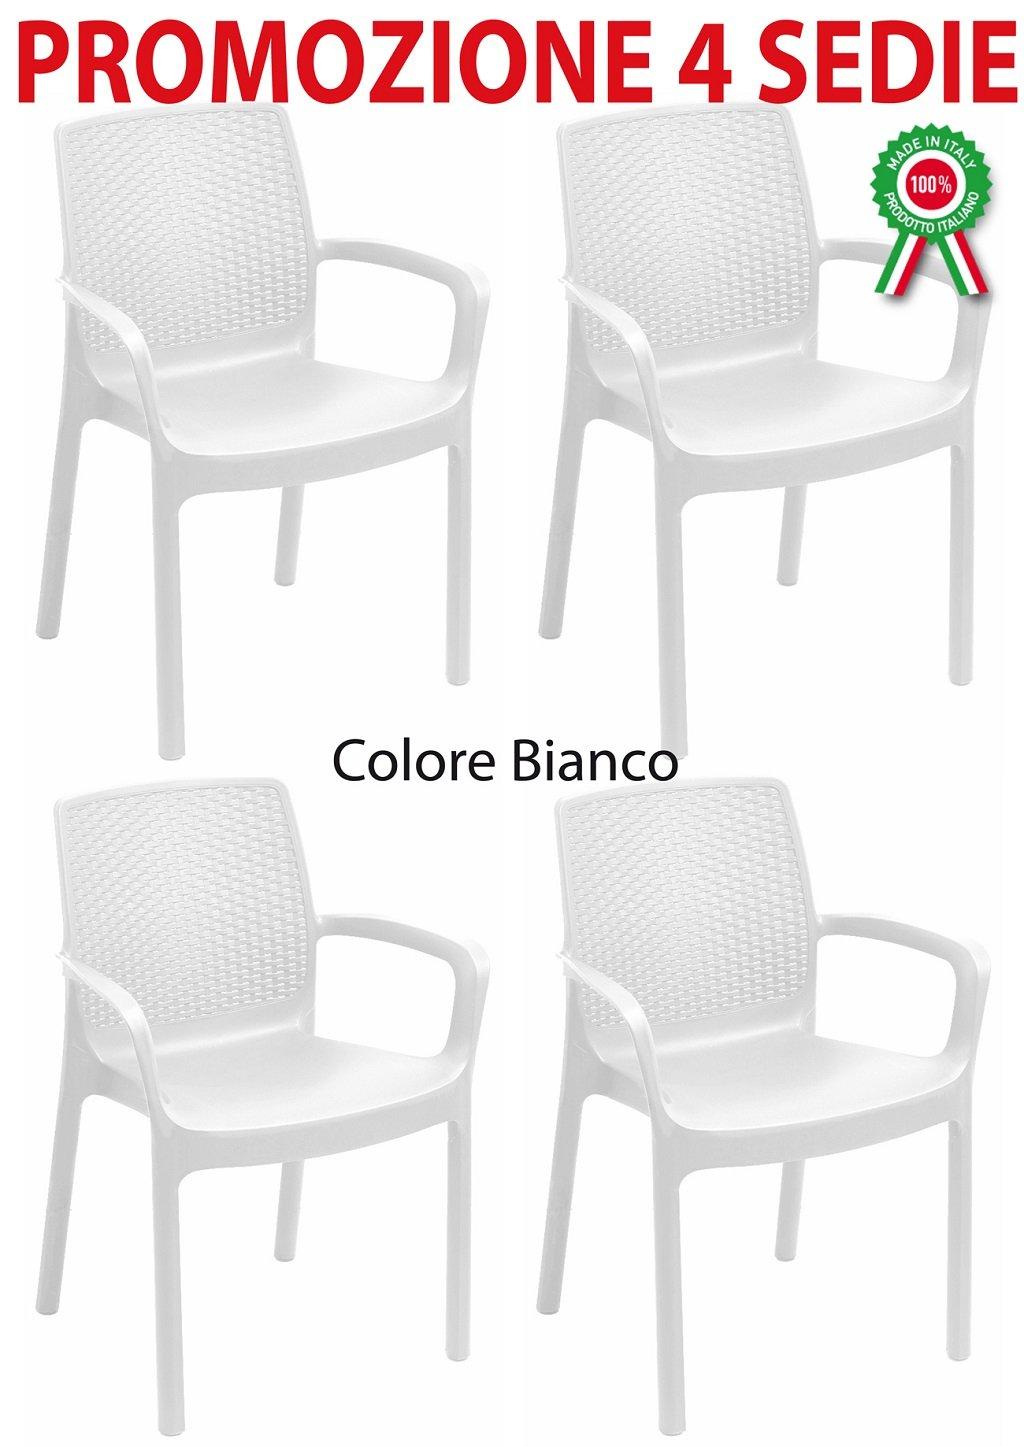 4 pz Poltrona sedia regina in dura resina finto rattan vimini bianca Savino Fiorenzo